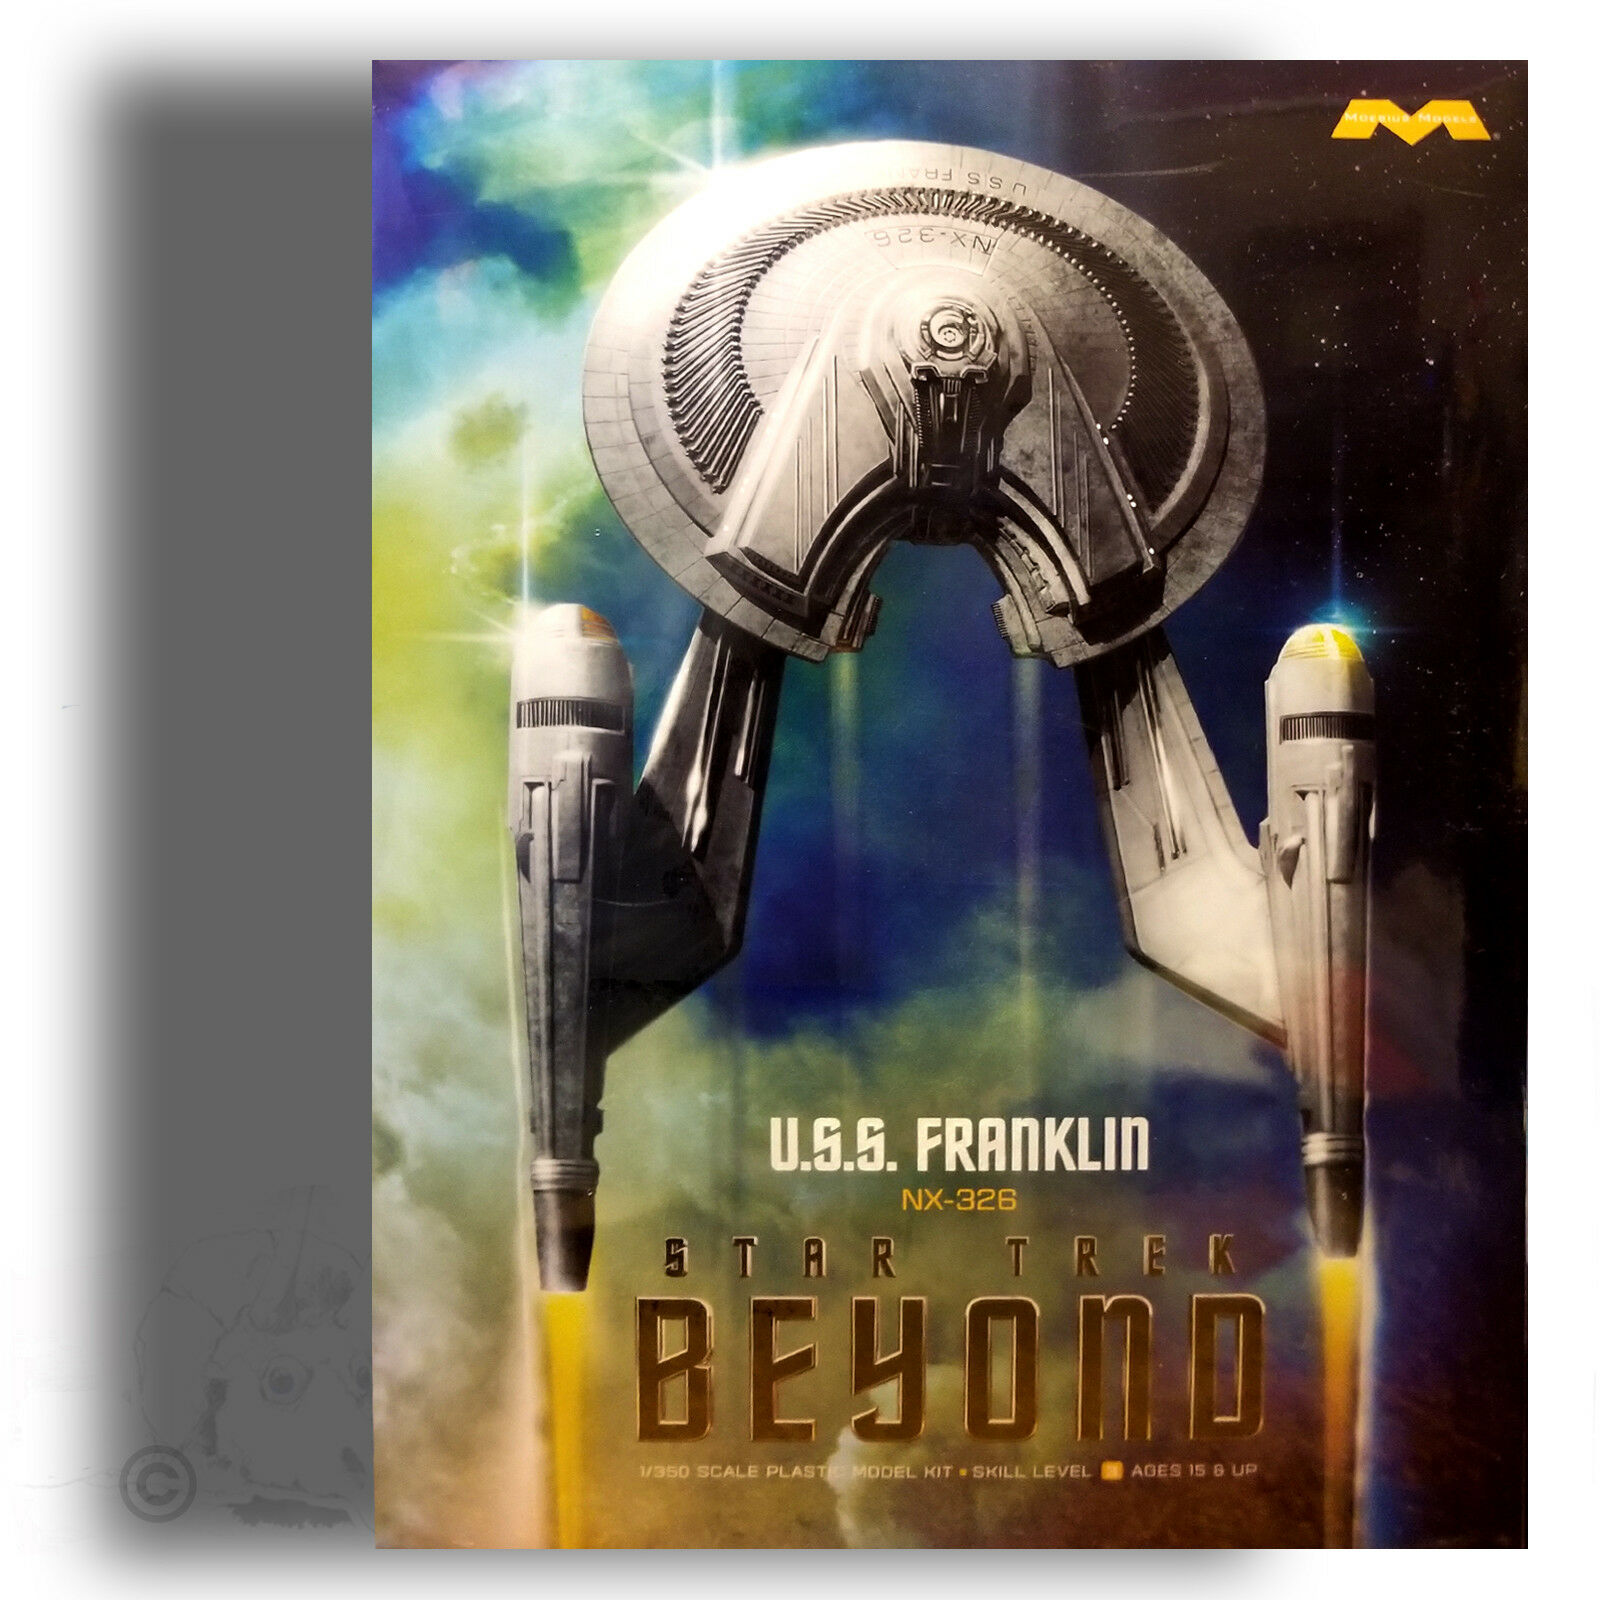 MOEBIUS MODELS 1 350 U.S.S. FRANKLIN 'STAR TREK BEYOND' MODEL KIT 975